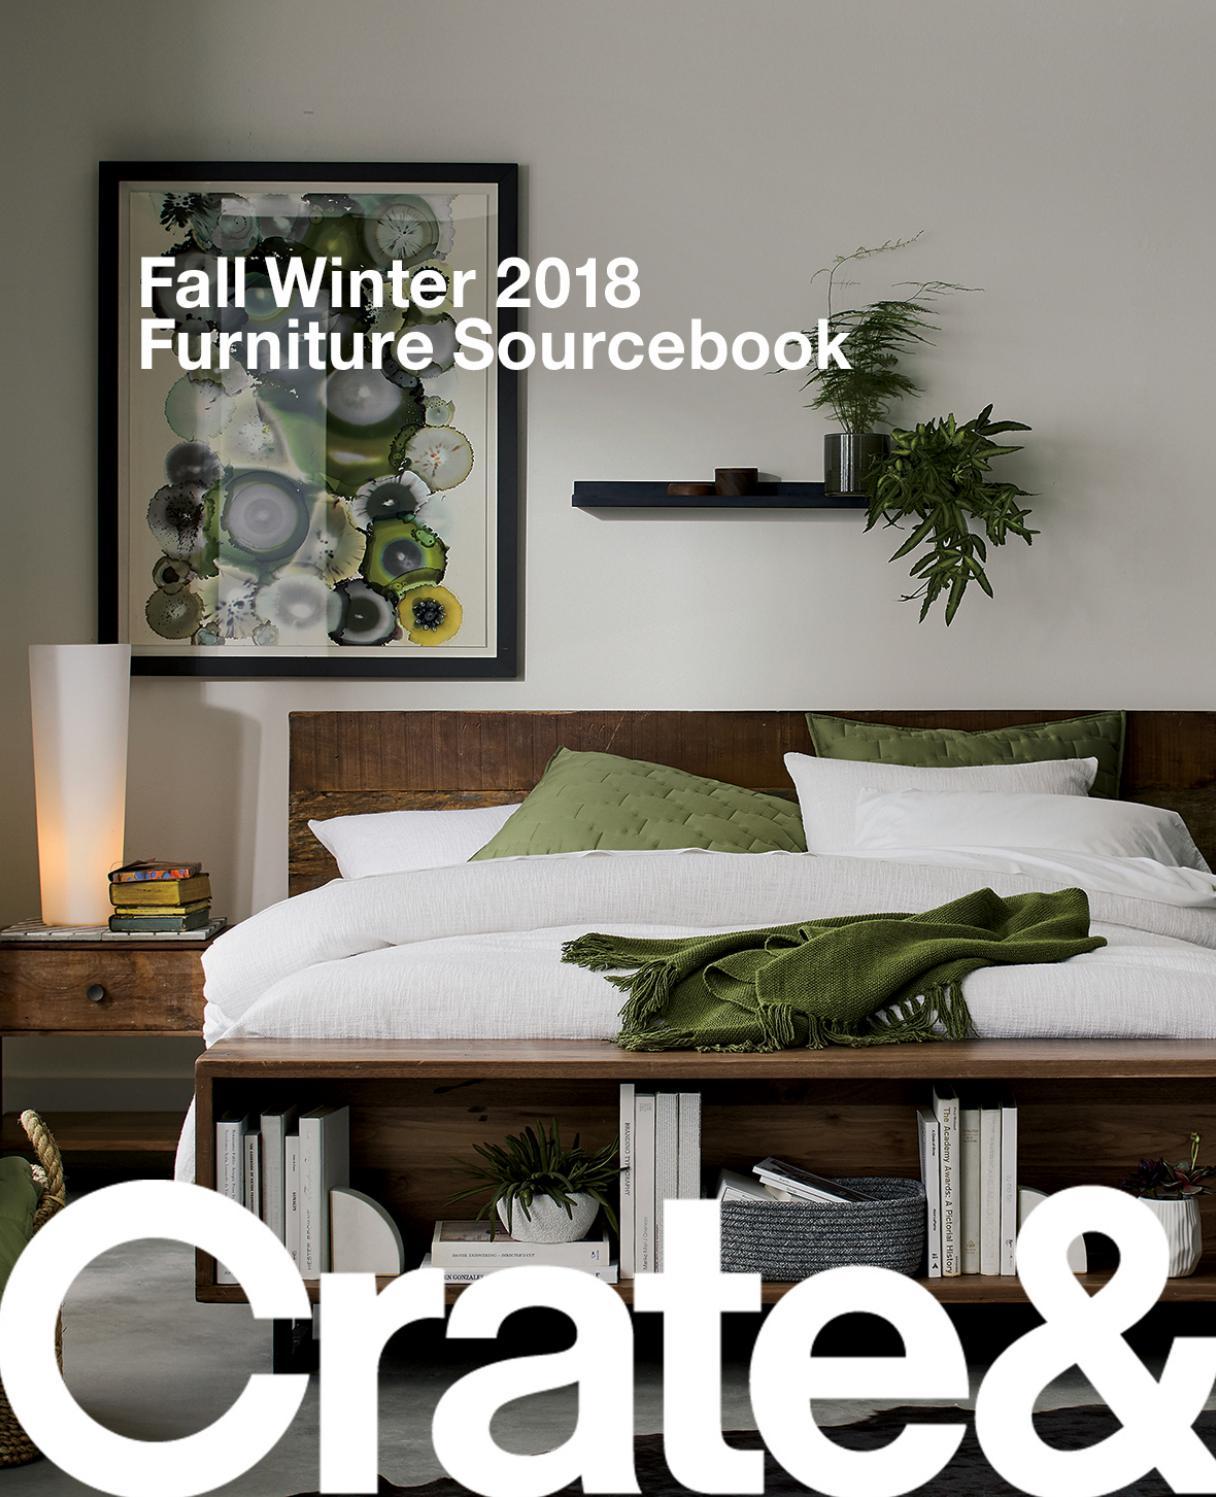 Crate and barrel fall winter 2018 furniture sourcebook